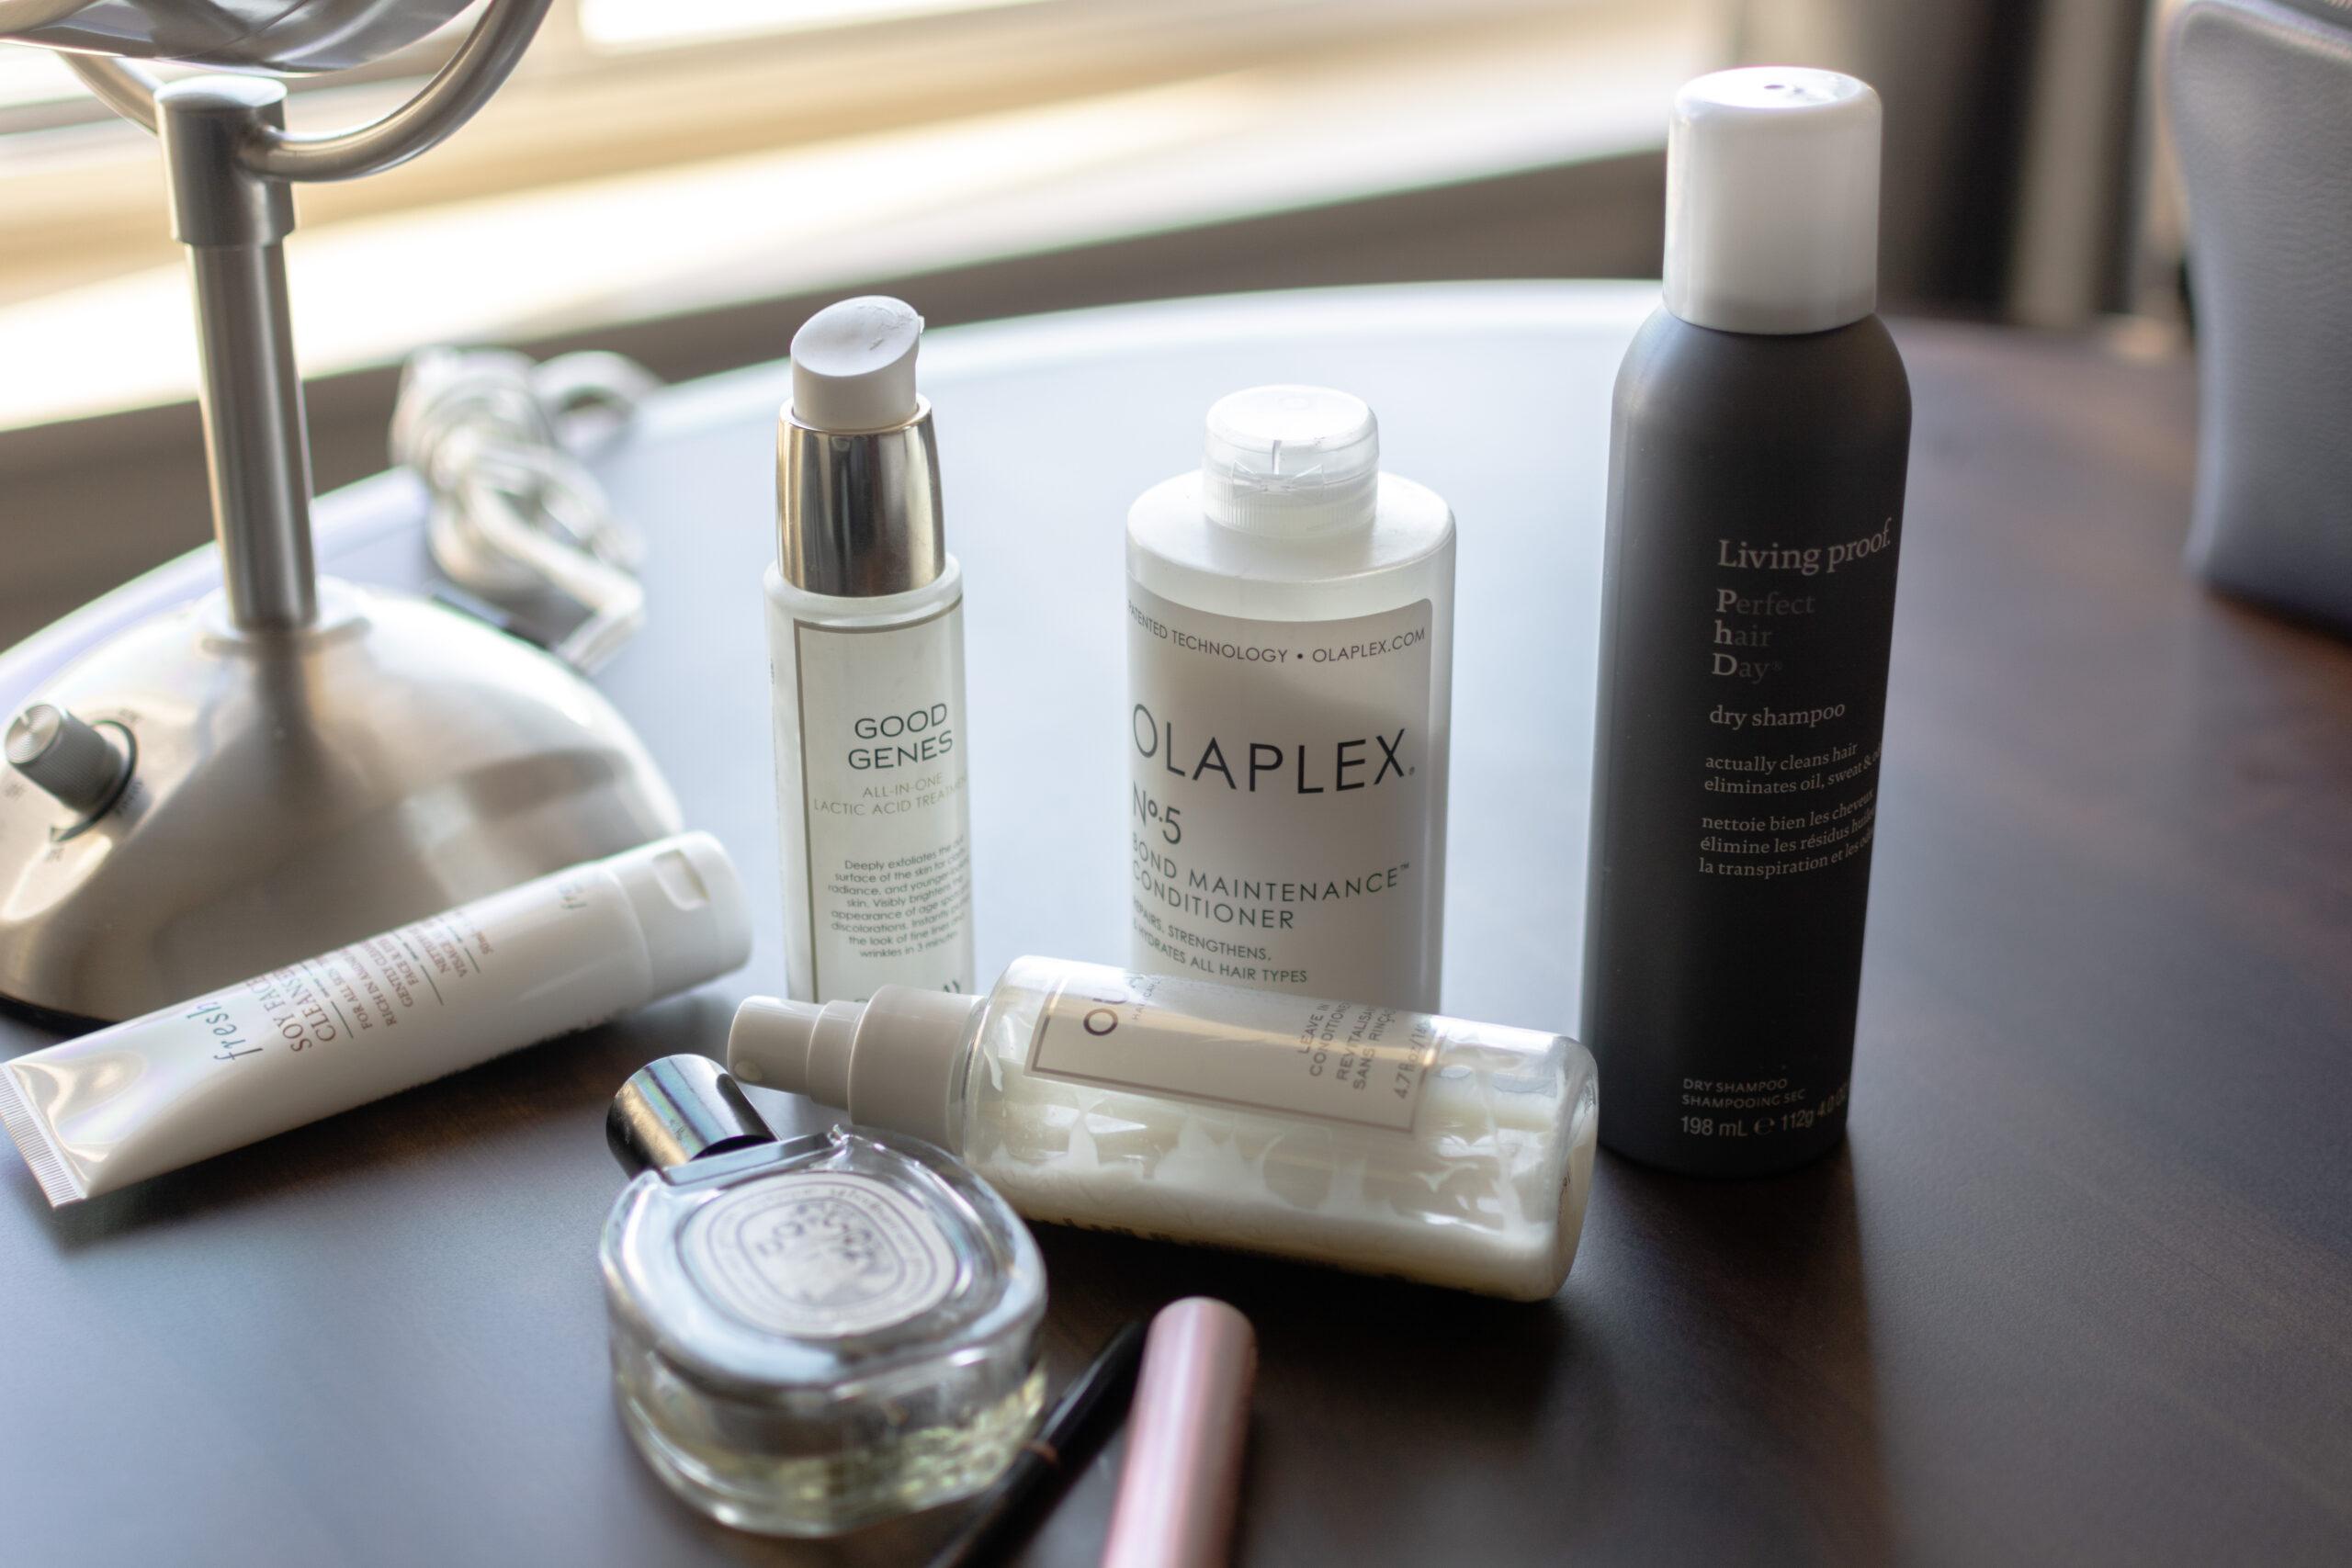 Nordstrom Anniversary Sale, Beauty Exclusives, Olaplex, Beauty Sale, Goon Genes, Living Proof